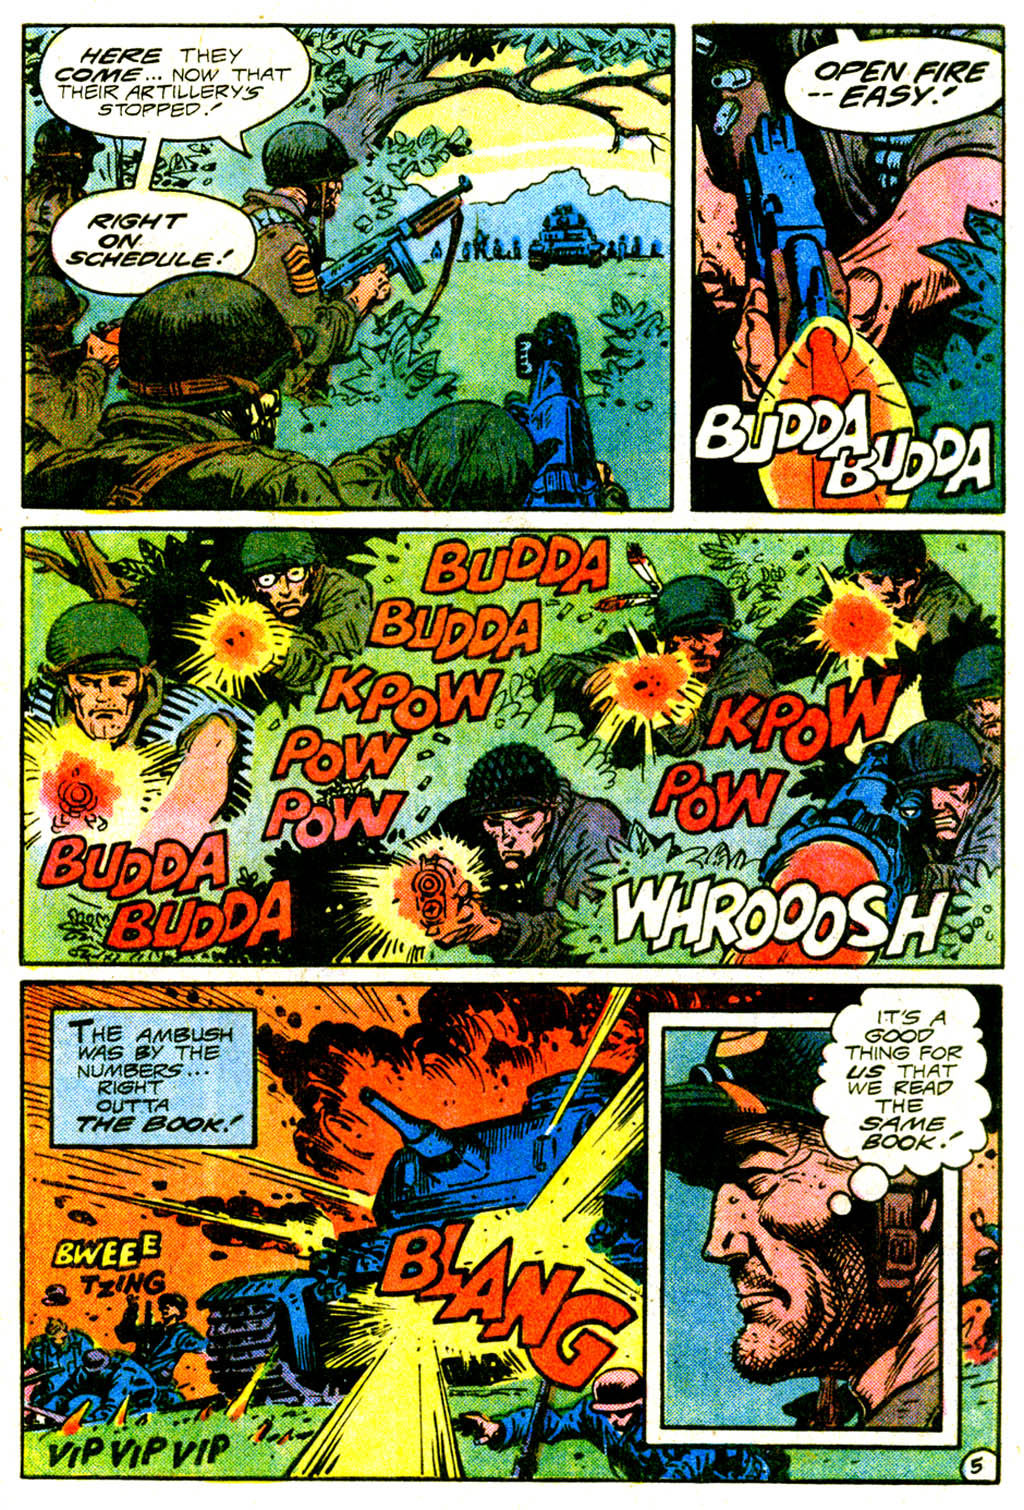 Read online Sgt. Rock comic -  Issue #375 - 8